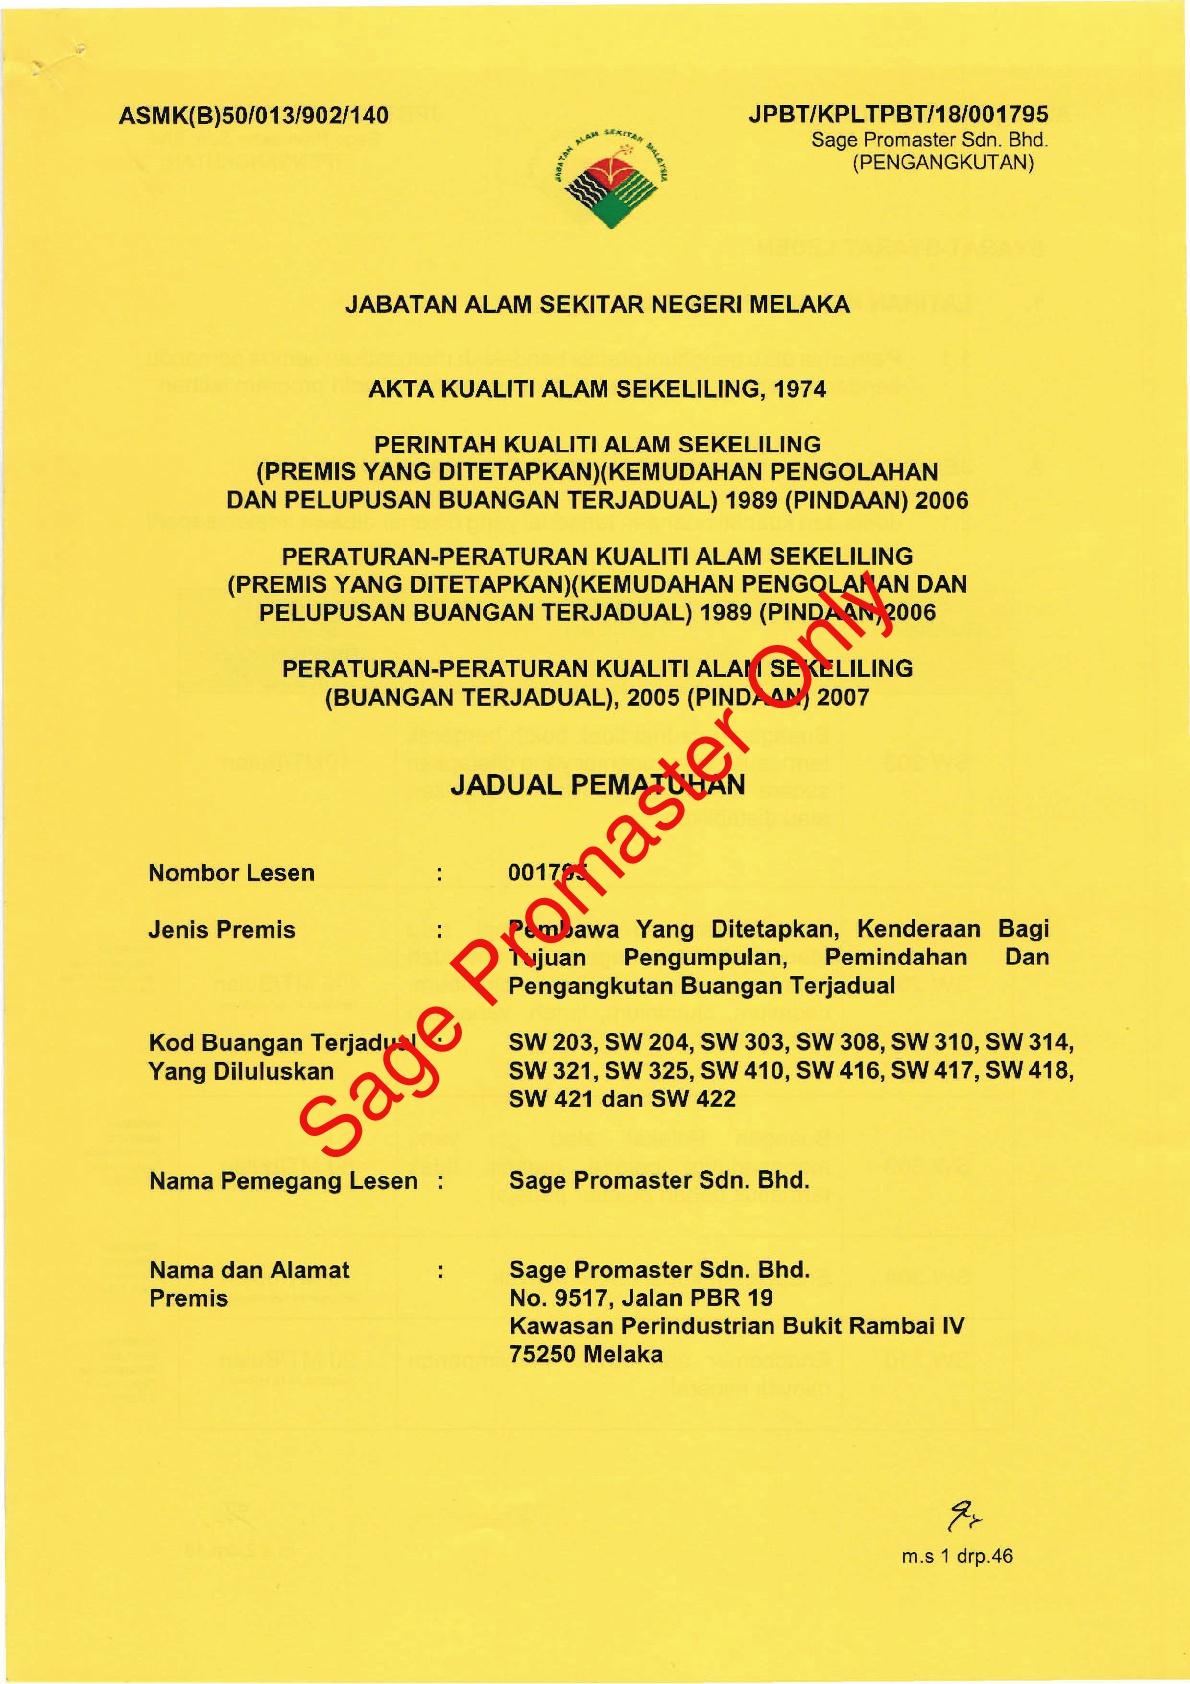 Jadual Pematuhan : No. Lesen 001795